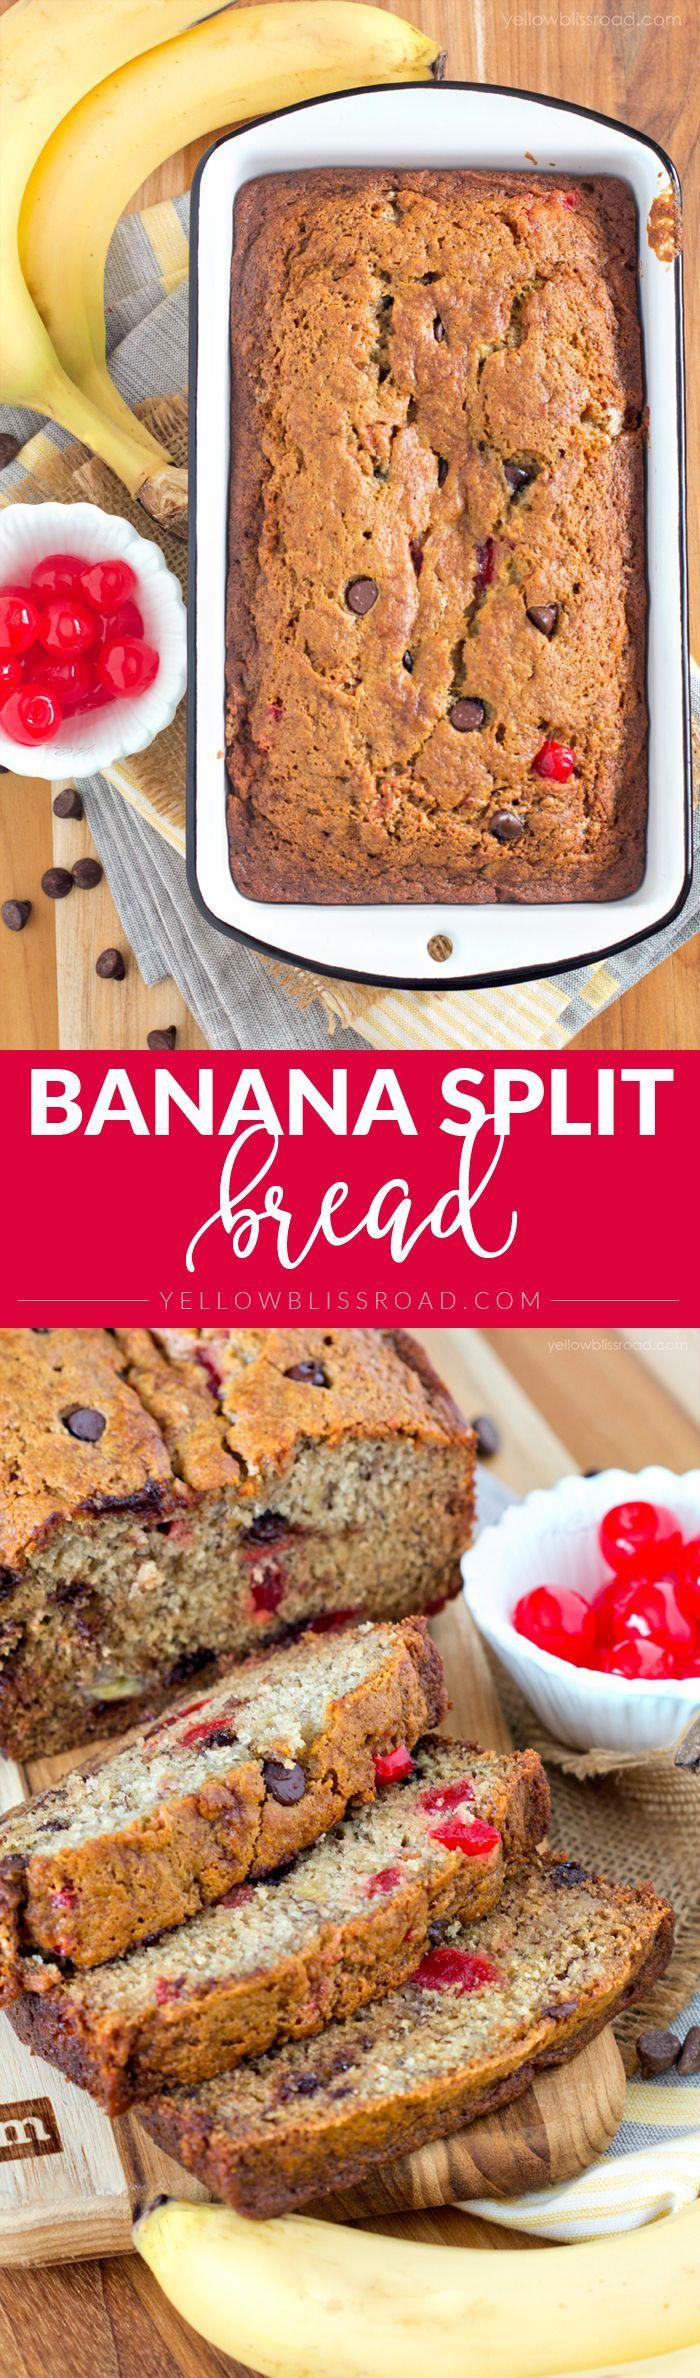 Smooshy Mushy Banana Split : Check out Banana Split Bread. It s so easy to make! Chocolate cherry, Cherries and Breads